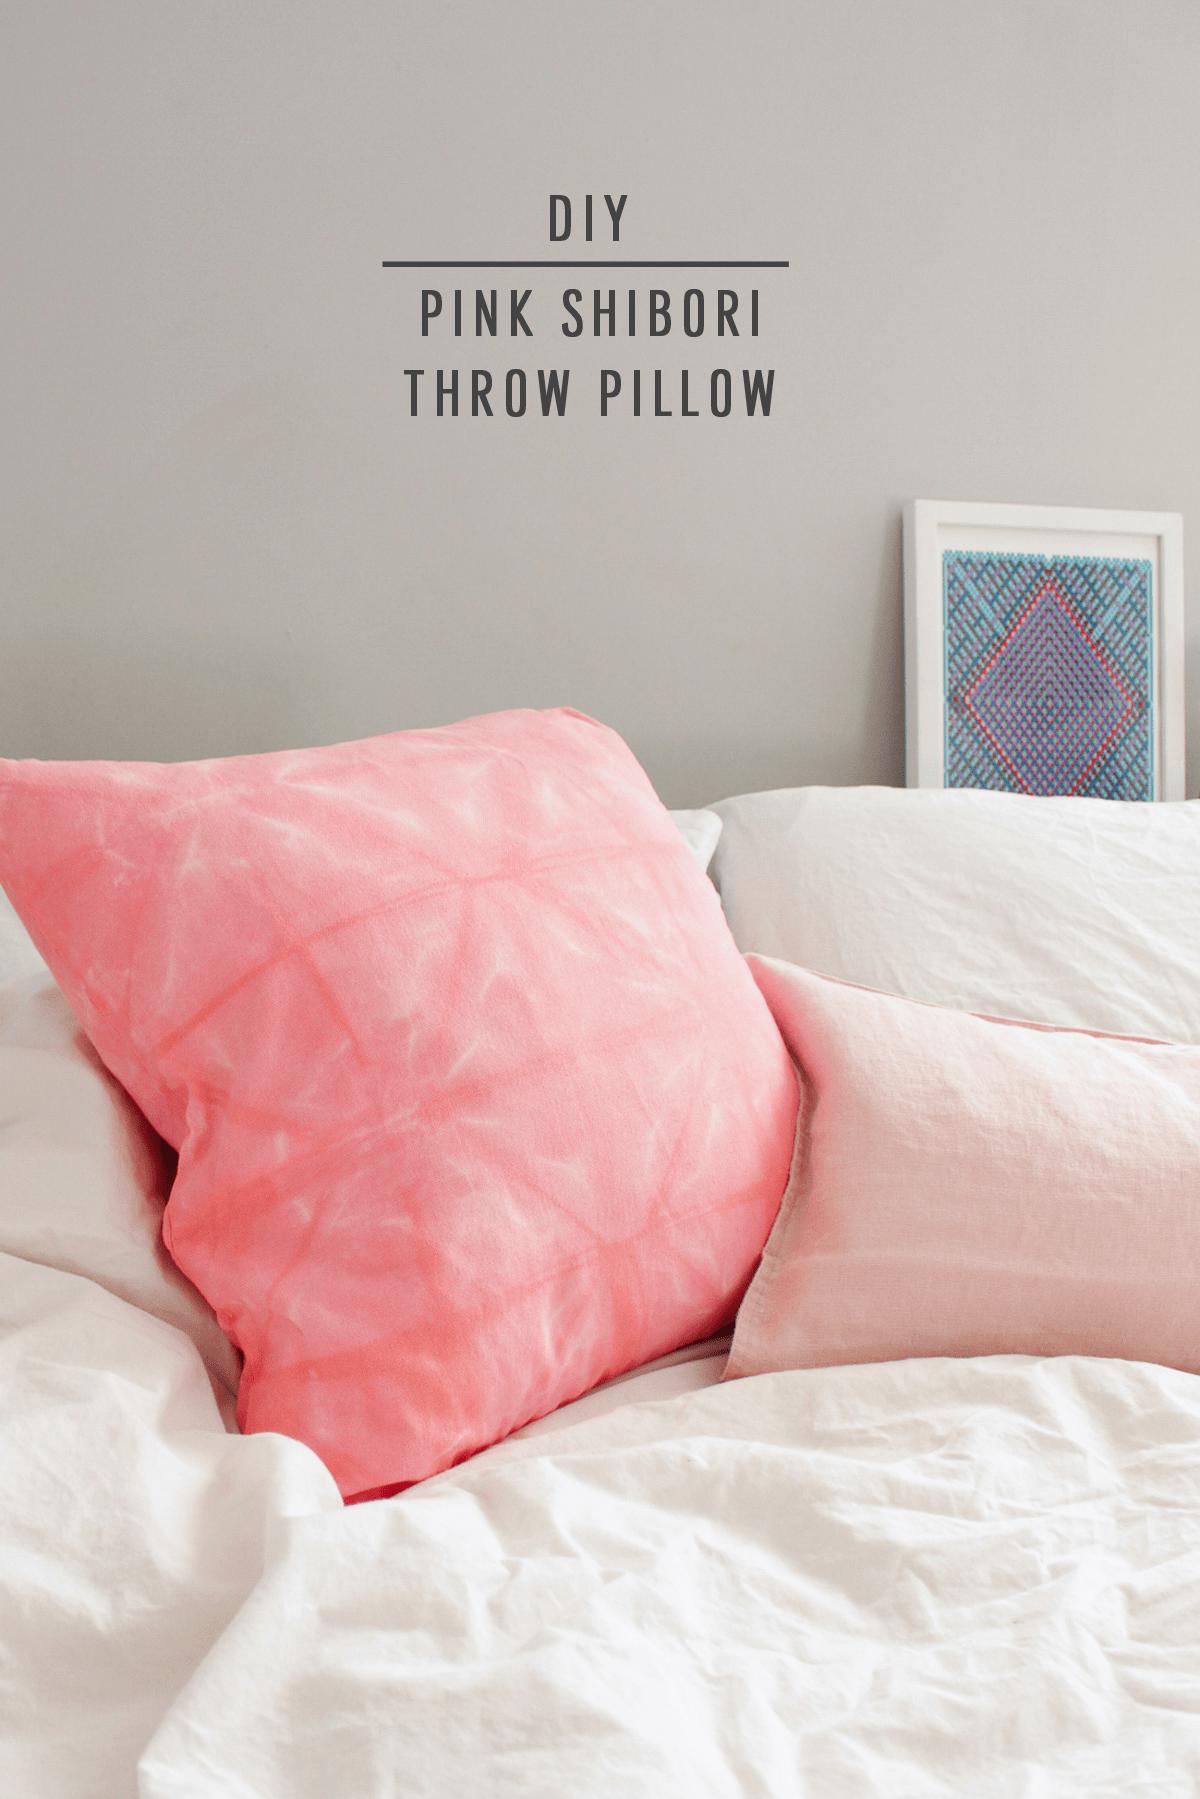 diy pink shibori throw pillow by sugar u0026 cloth an award winning diy and home